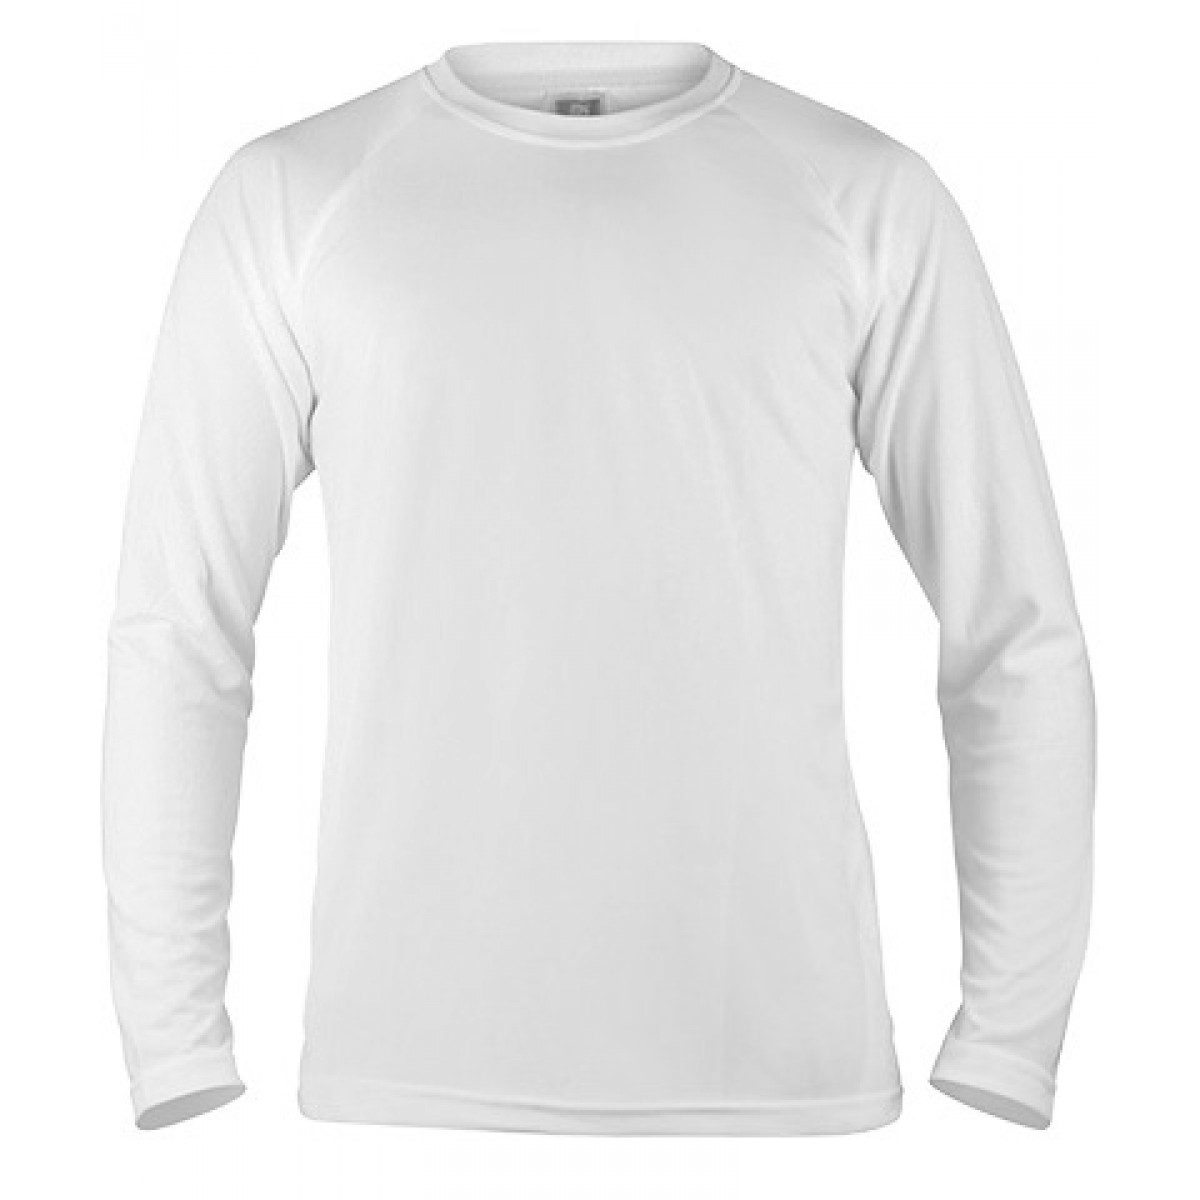 Long Sleeve Mesh Performance T-shirt-White-YM